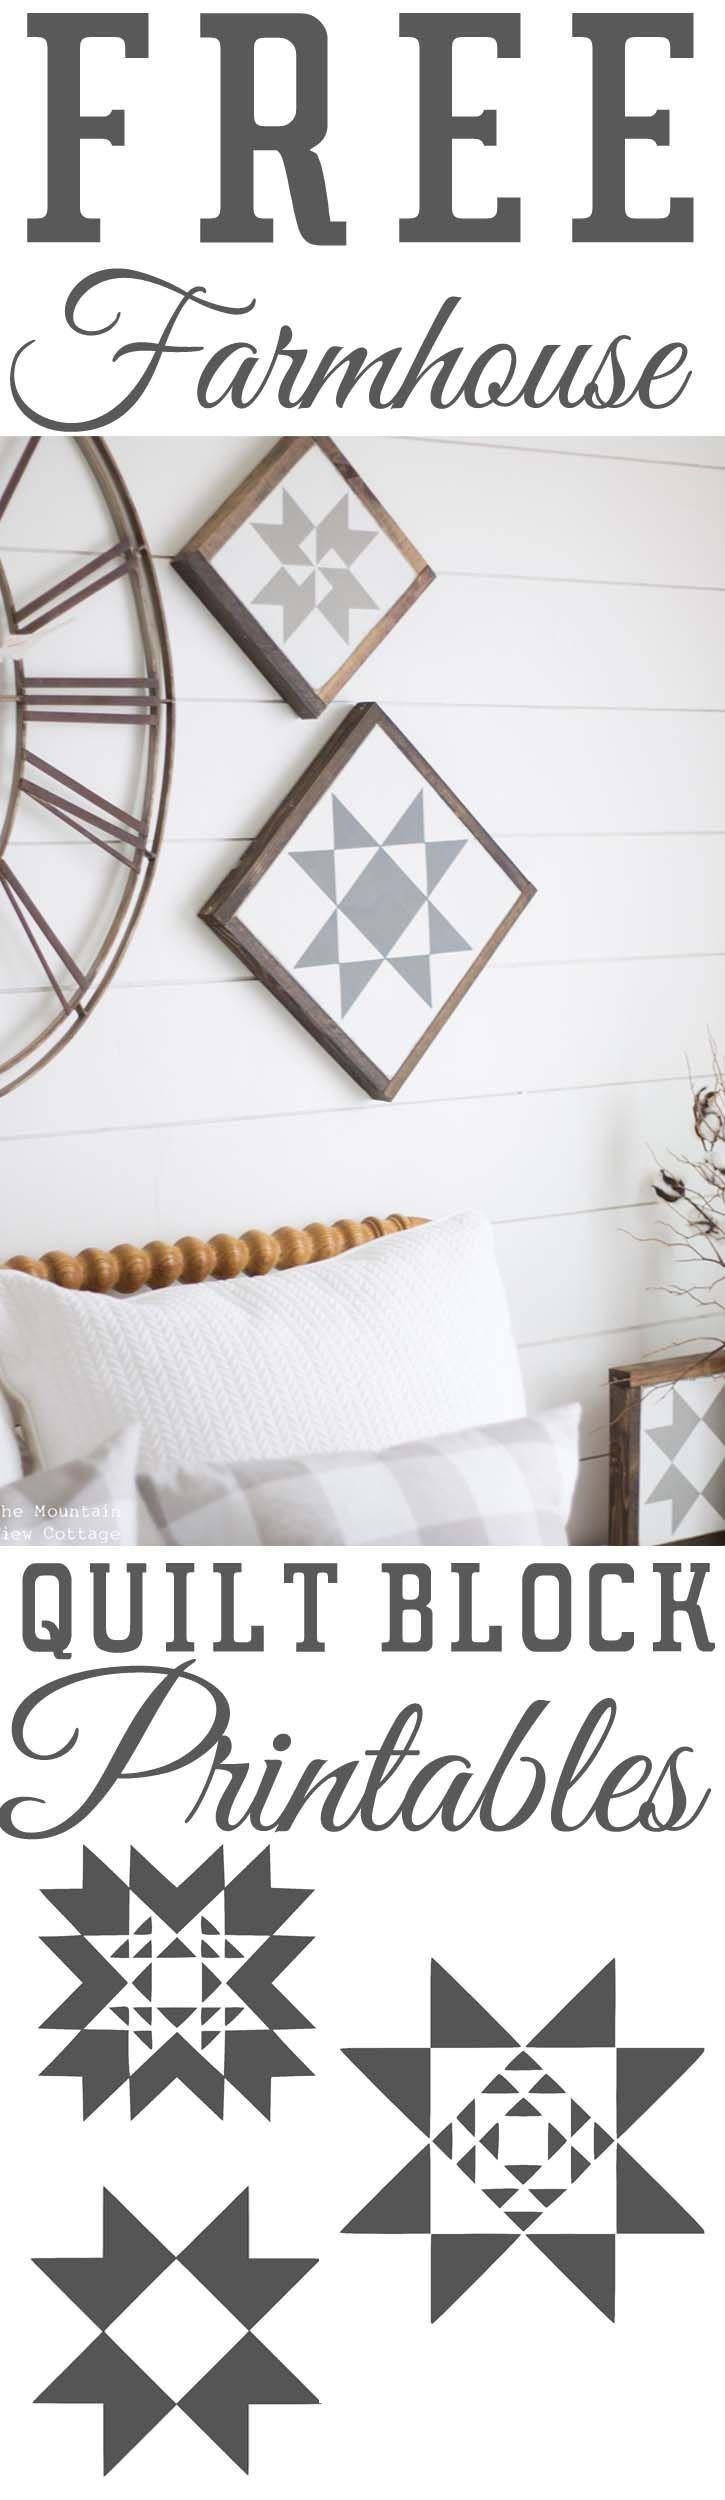 Free Farmhouse Printables Quilt Block Stars — The Mountain View Cottage